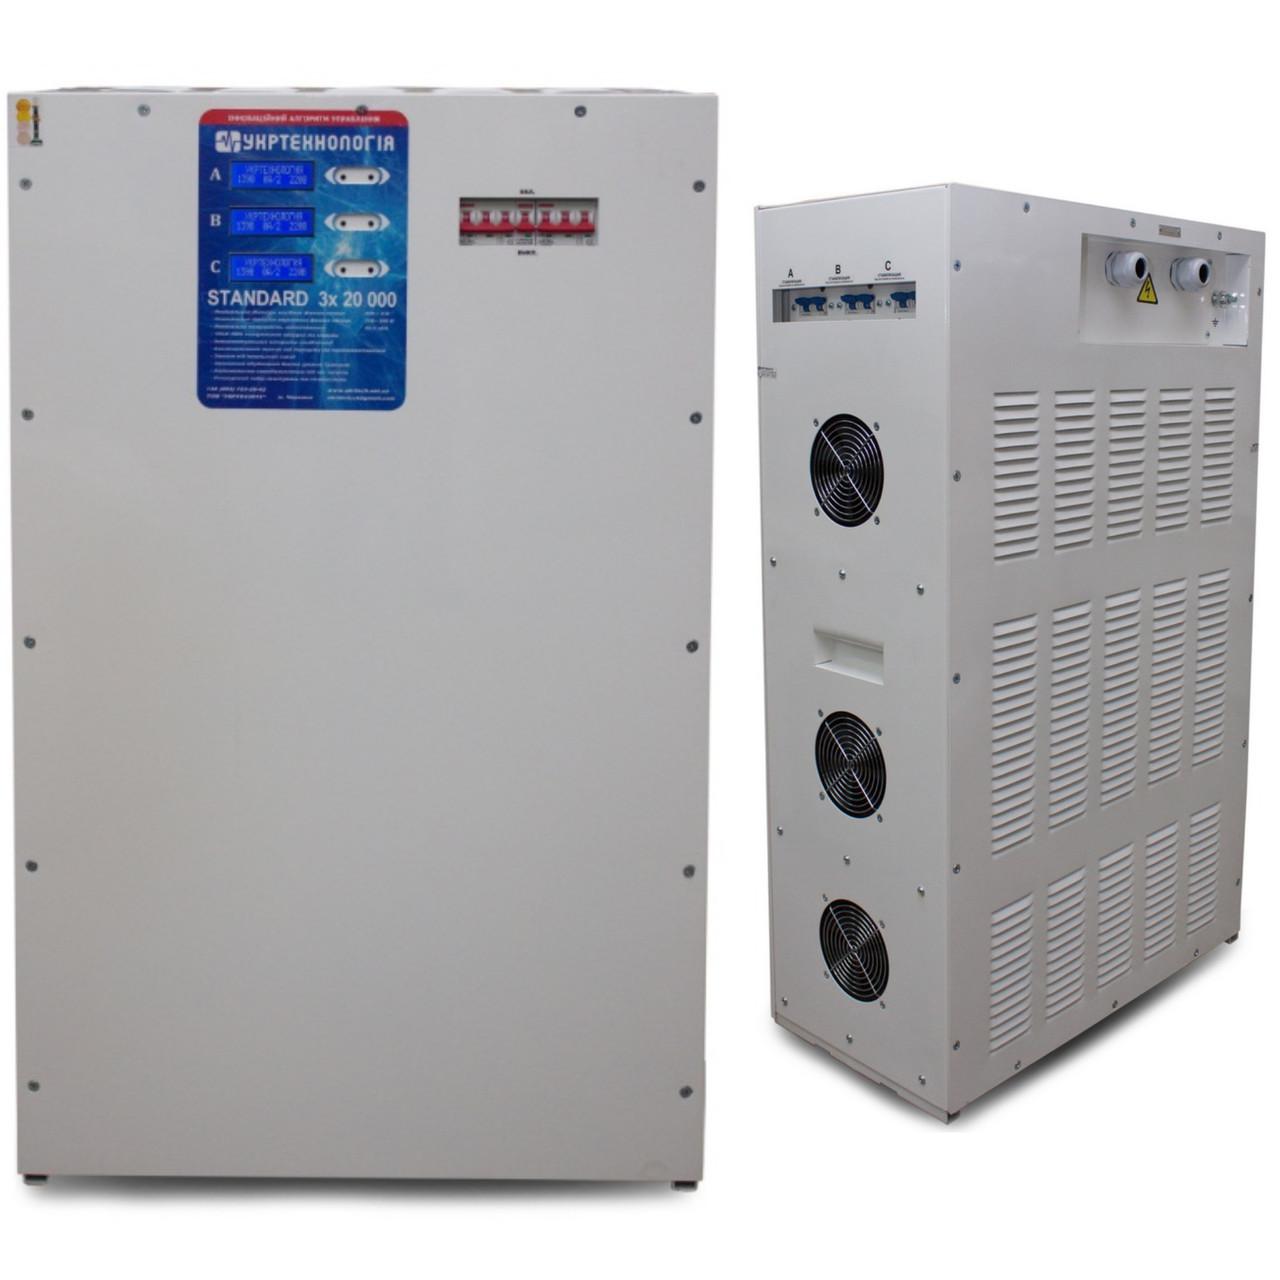 Стабилизатор напряжения Укртехнология HCH 3x15000 Standard 45 кВт